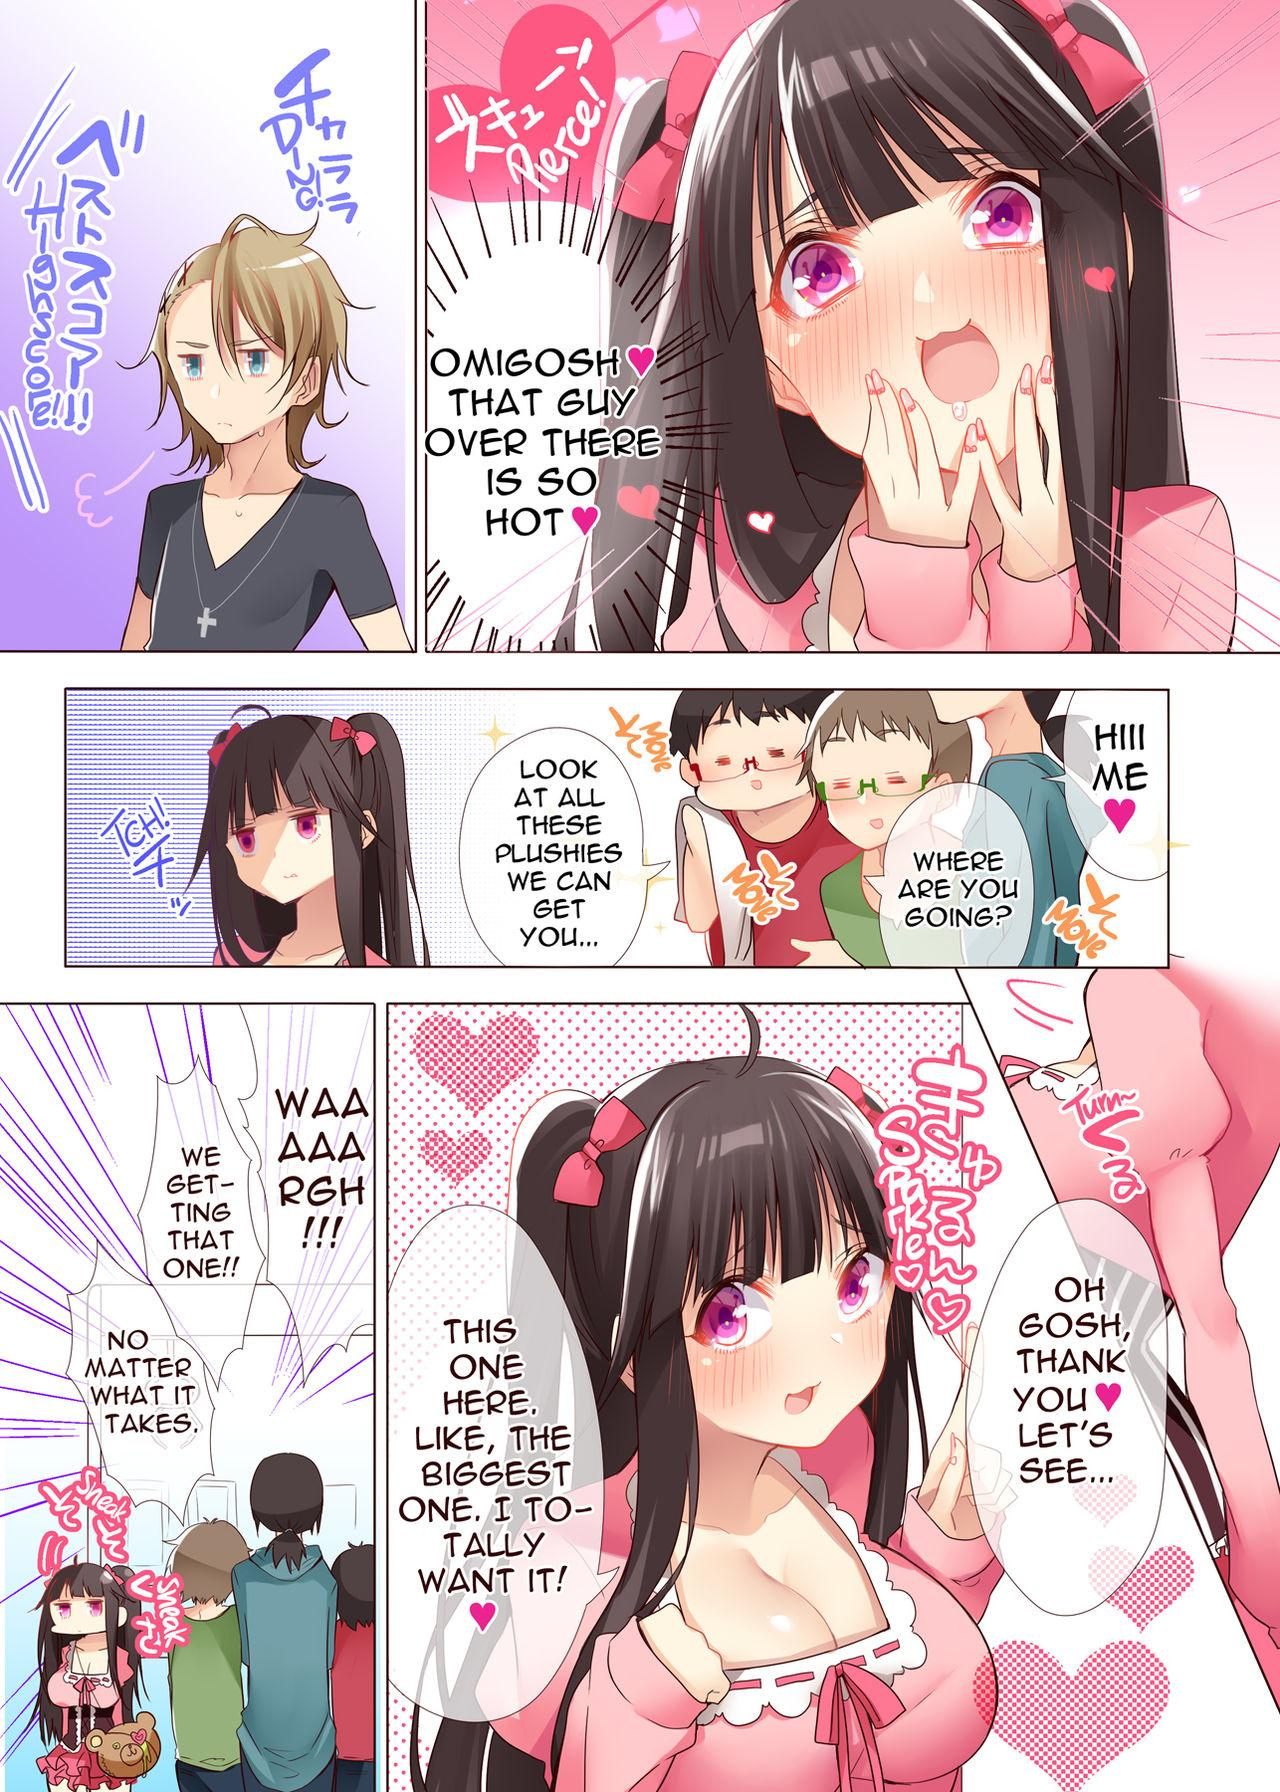 The Princess of an Otaku Group Got Knocked Up by Some Piece of Trash So She Let an Otaku Guy Do Her Too!? 3